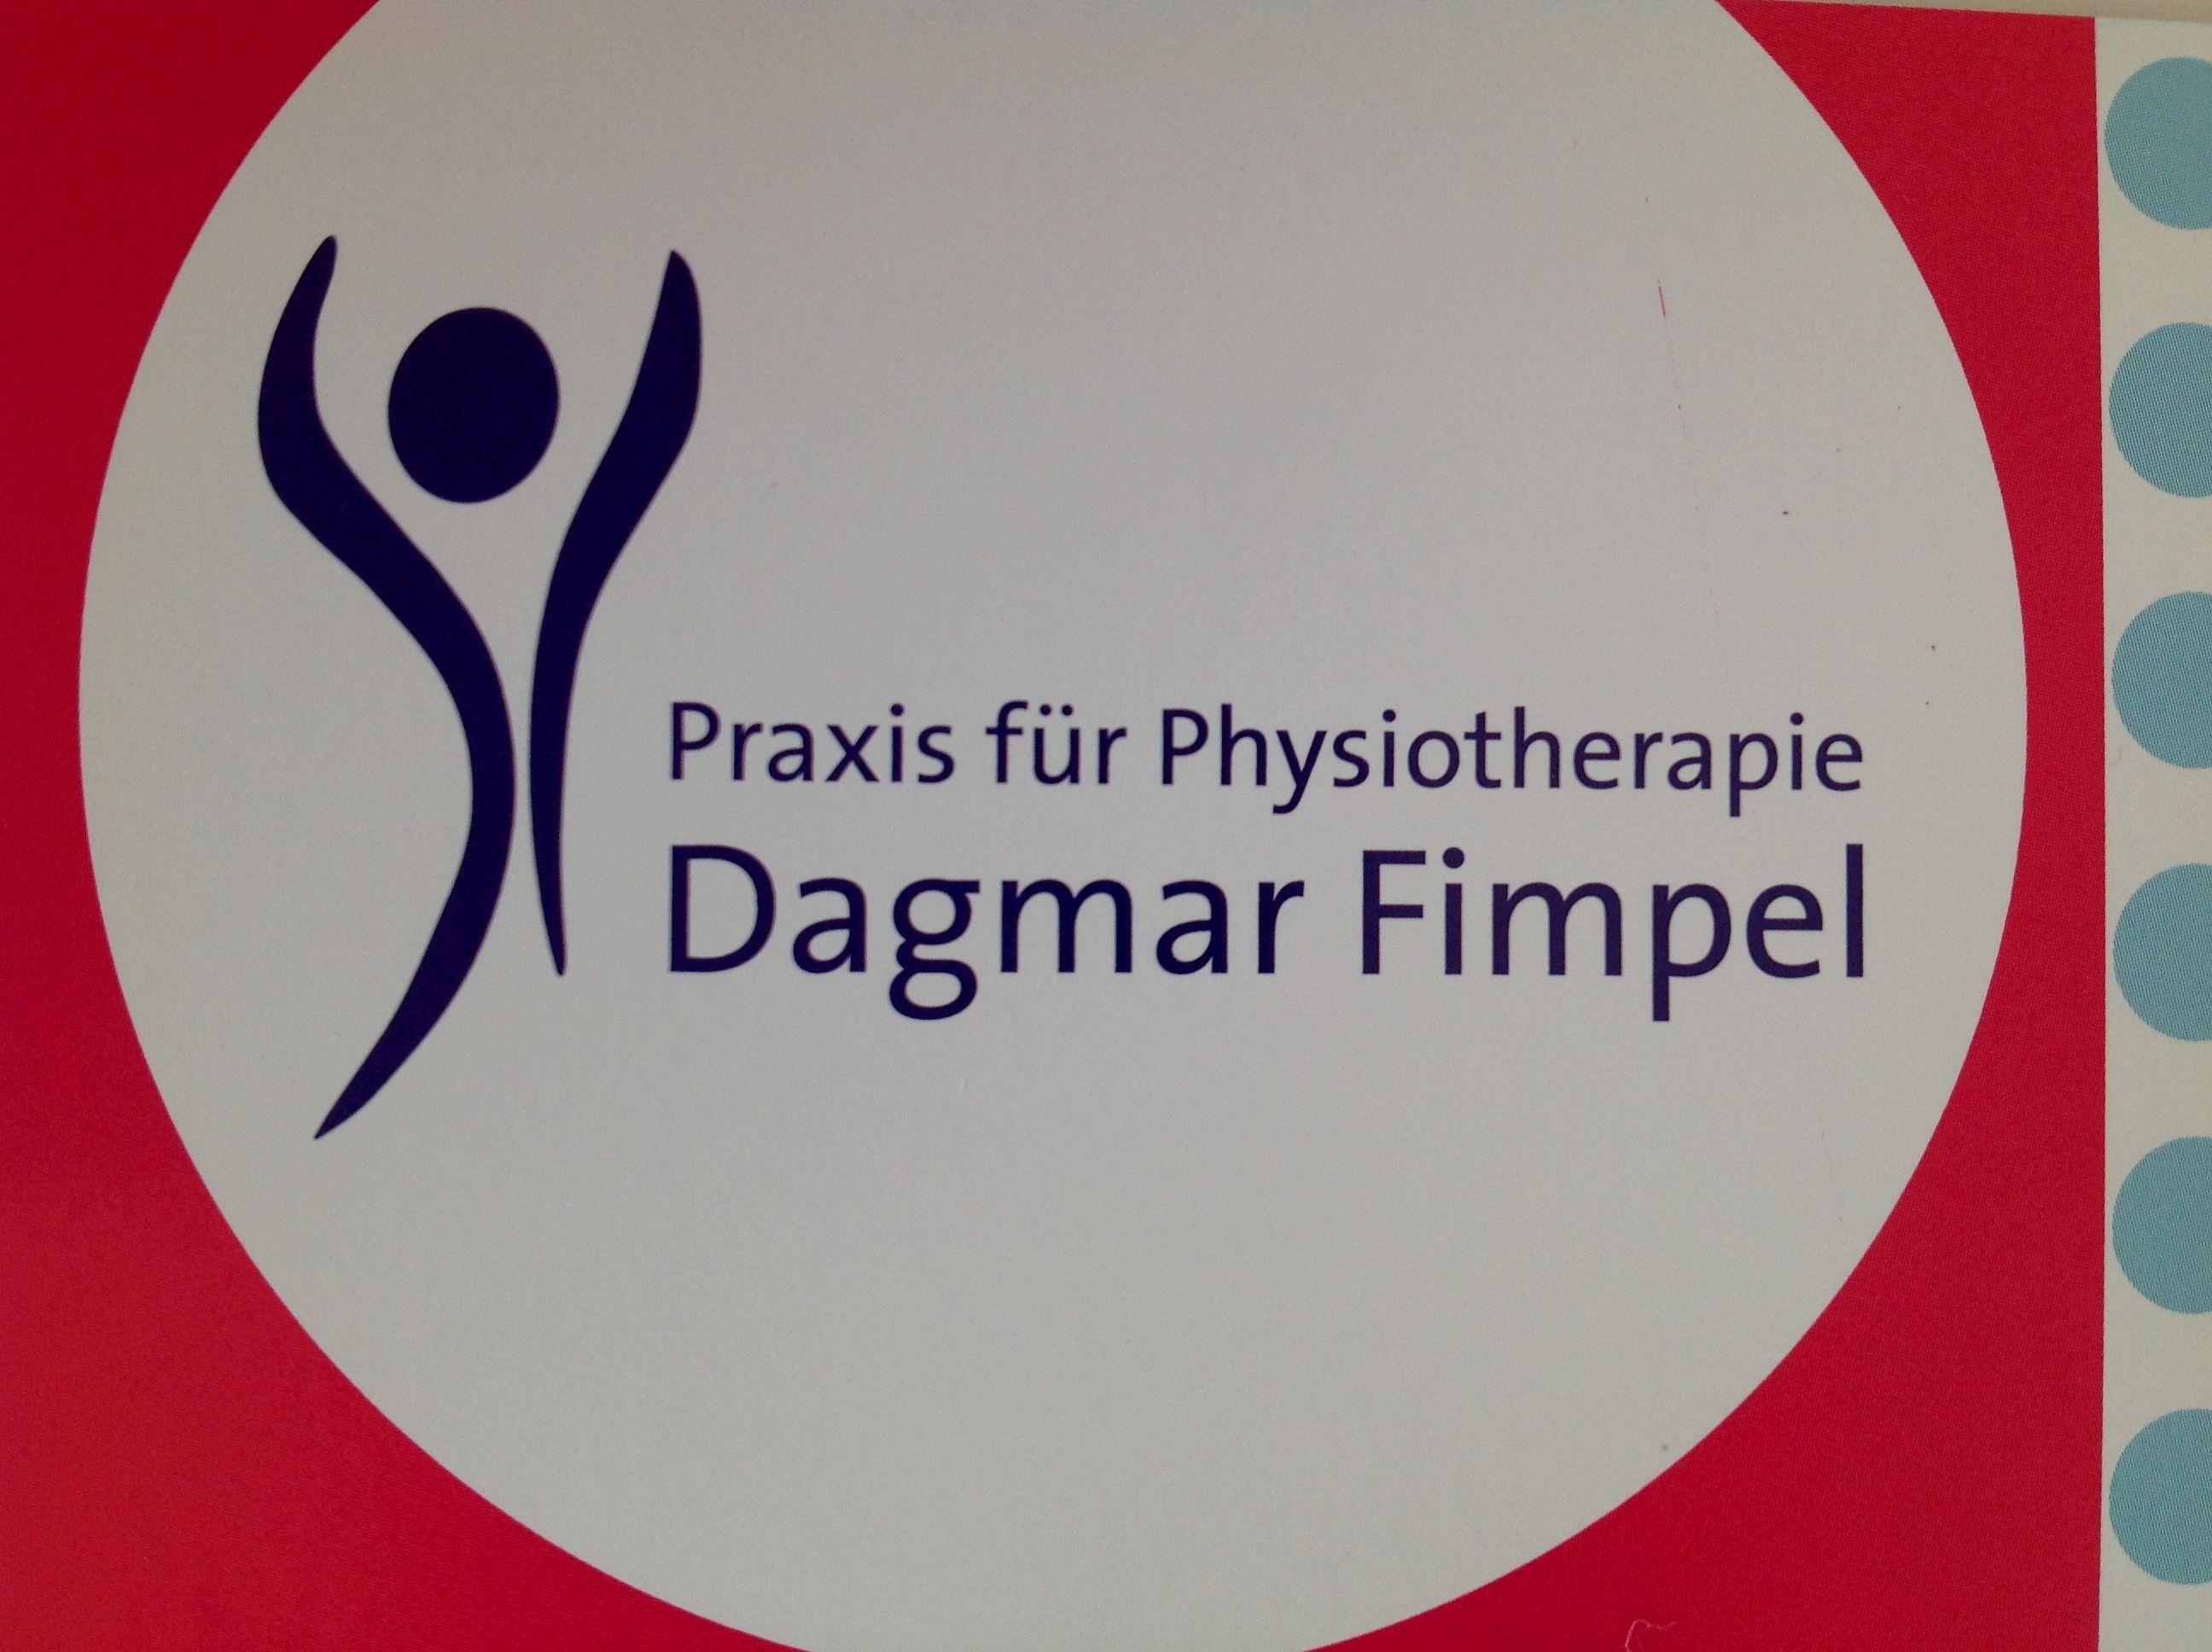 Praxis für Physiotherapie Dagmar Fimpel